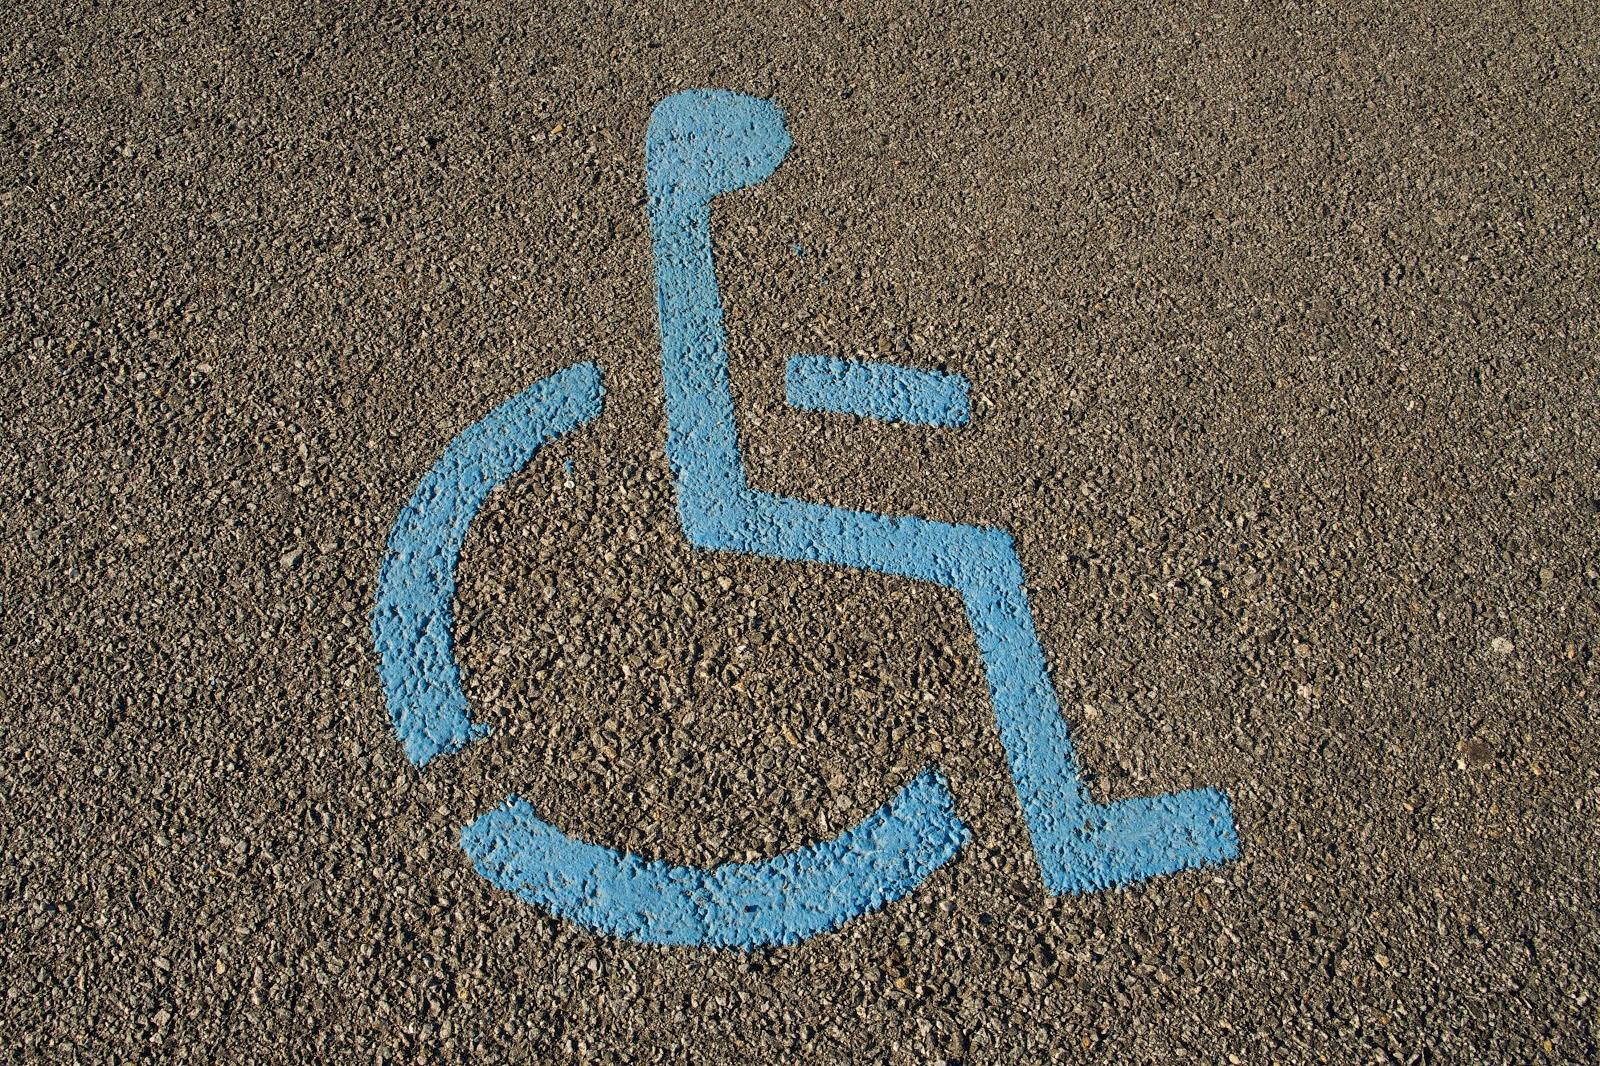 Asfalto pintado com símbolo de vaga especial para cadeirante